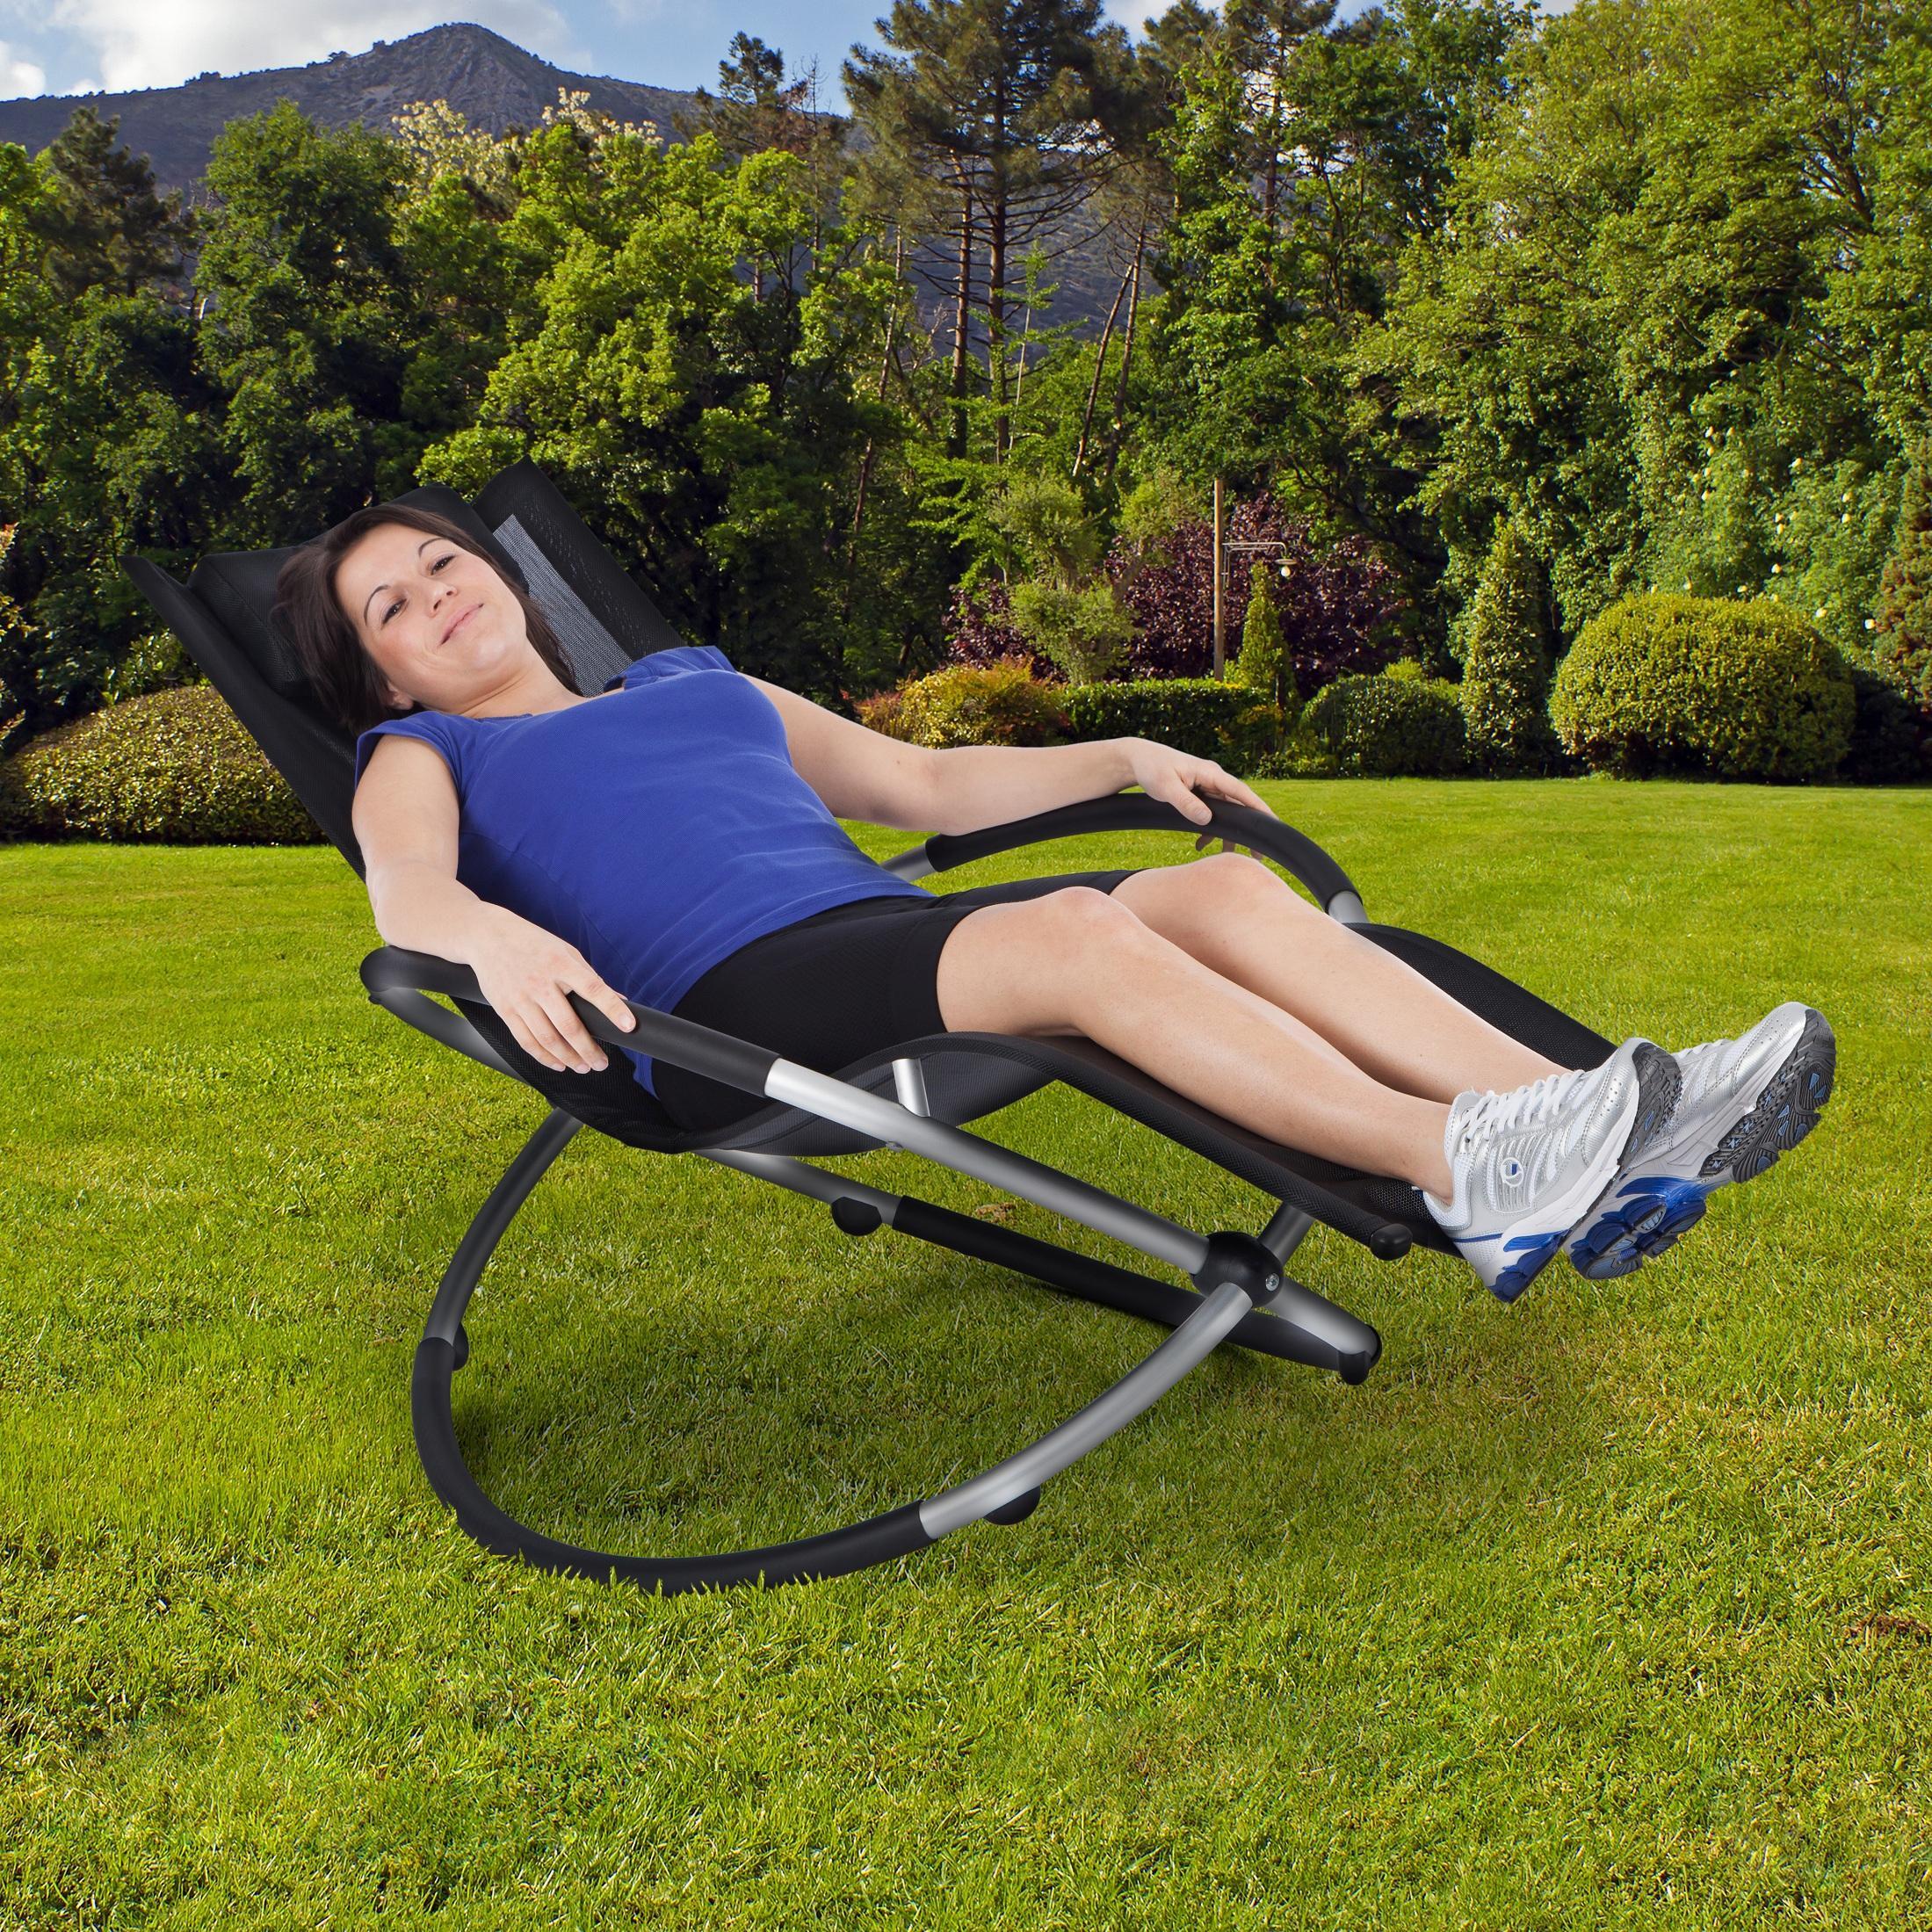 Ultranatura relax chaise longue de jardin en aluminium for Chaise longue jardin amazon